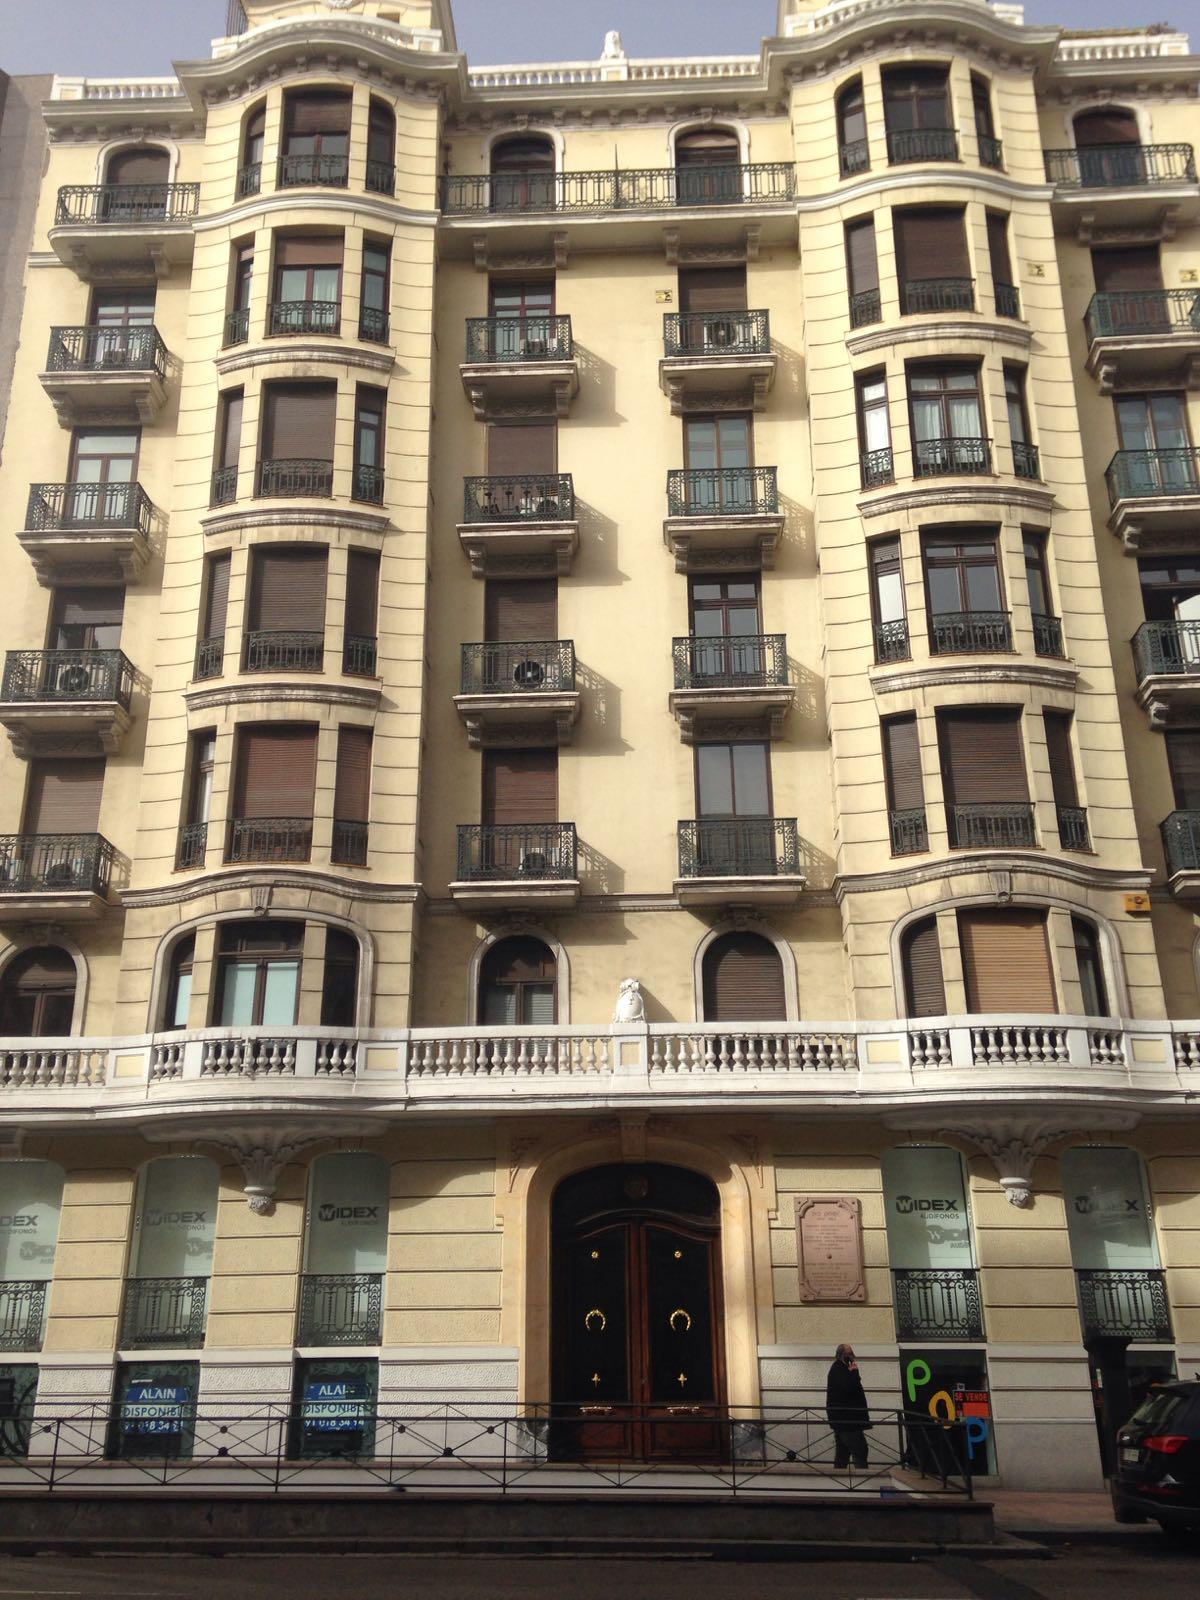 5e37214dd2a8 Traslado de sede social a la Calle Velázquez 27 1º Exterior Izquierda.  Madrid.